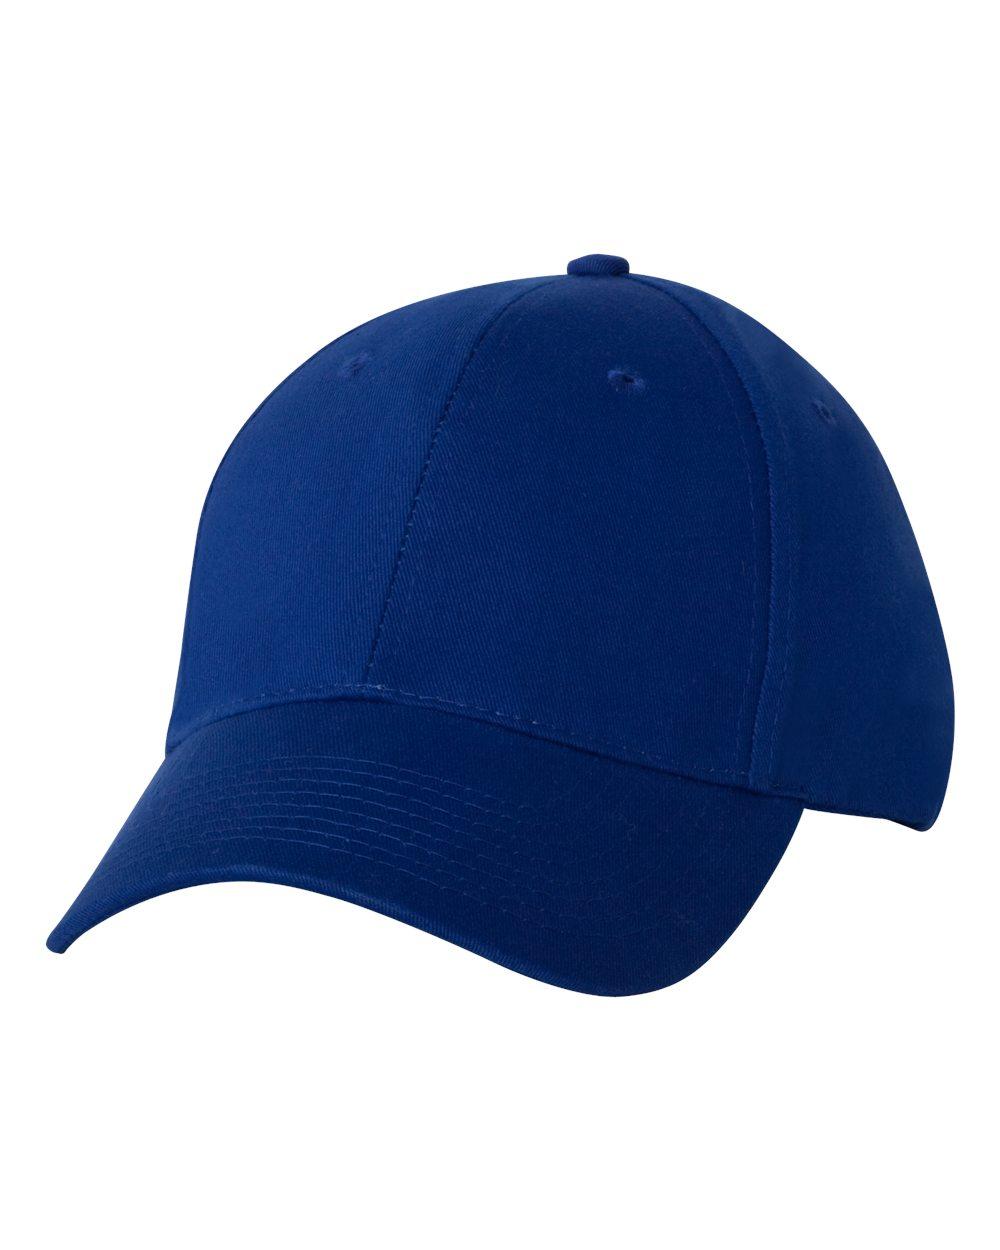 Bayside-Mens-Baseball-USA-Made-Structured-Cap-Hat-3660-six-panel-mid-profile thumbnail 12